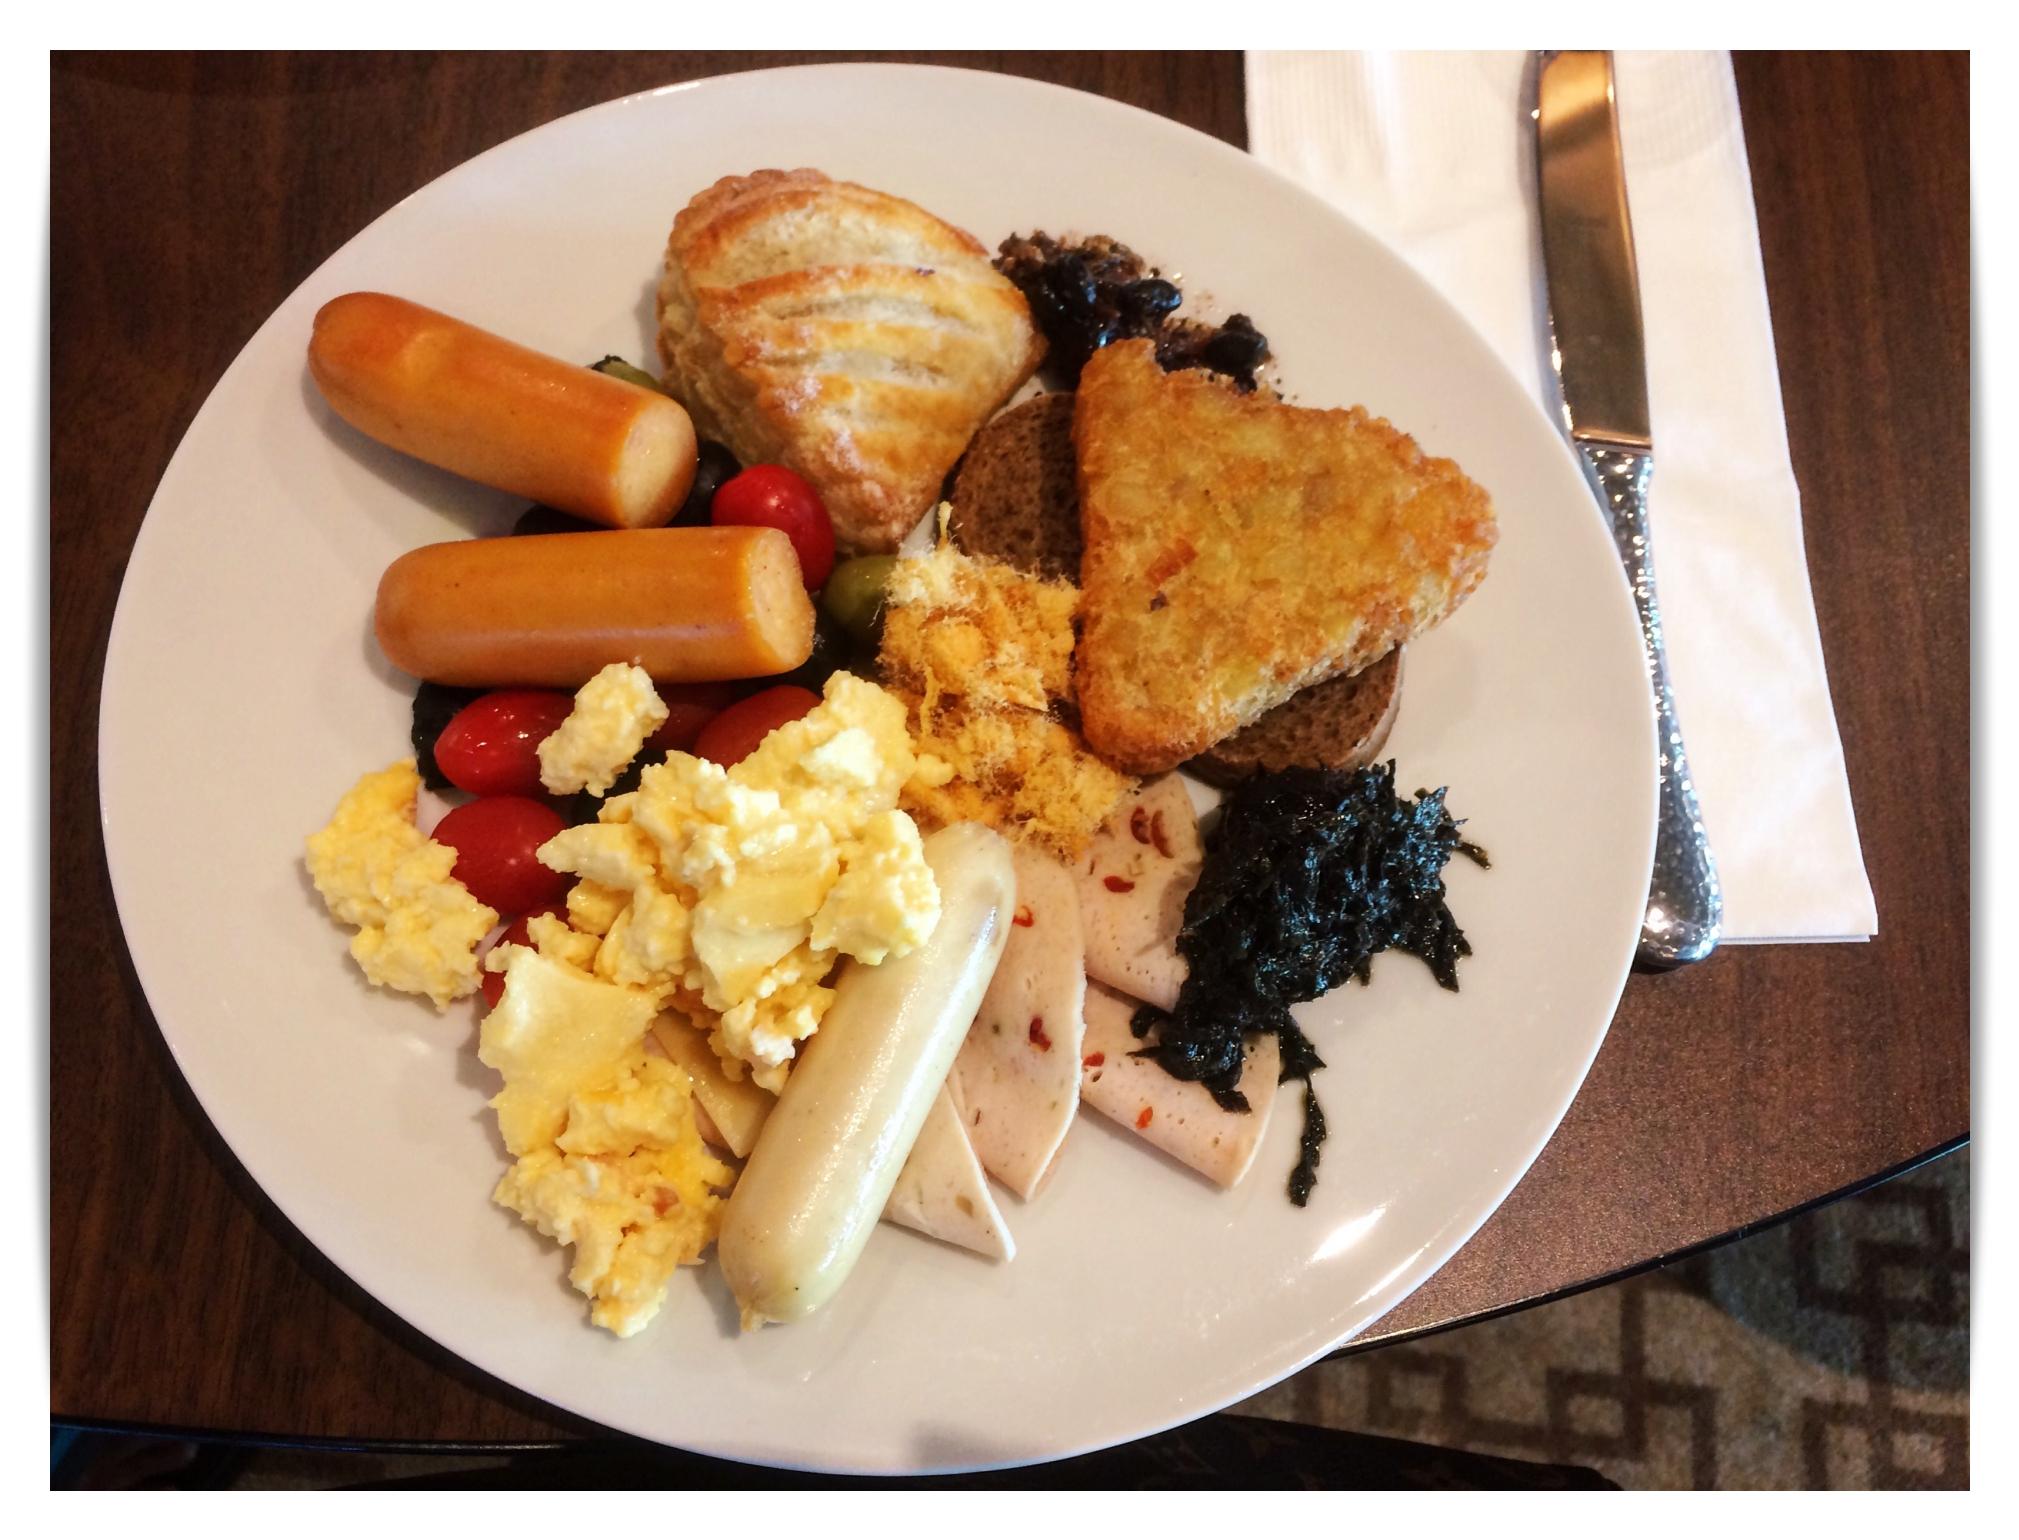 Gentring Dream Lido Breakfast